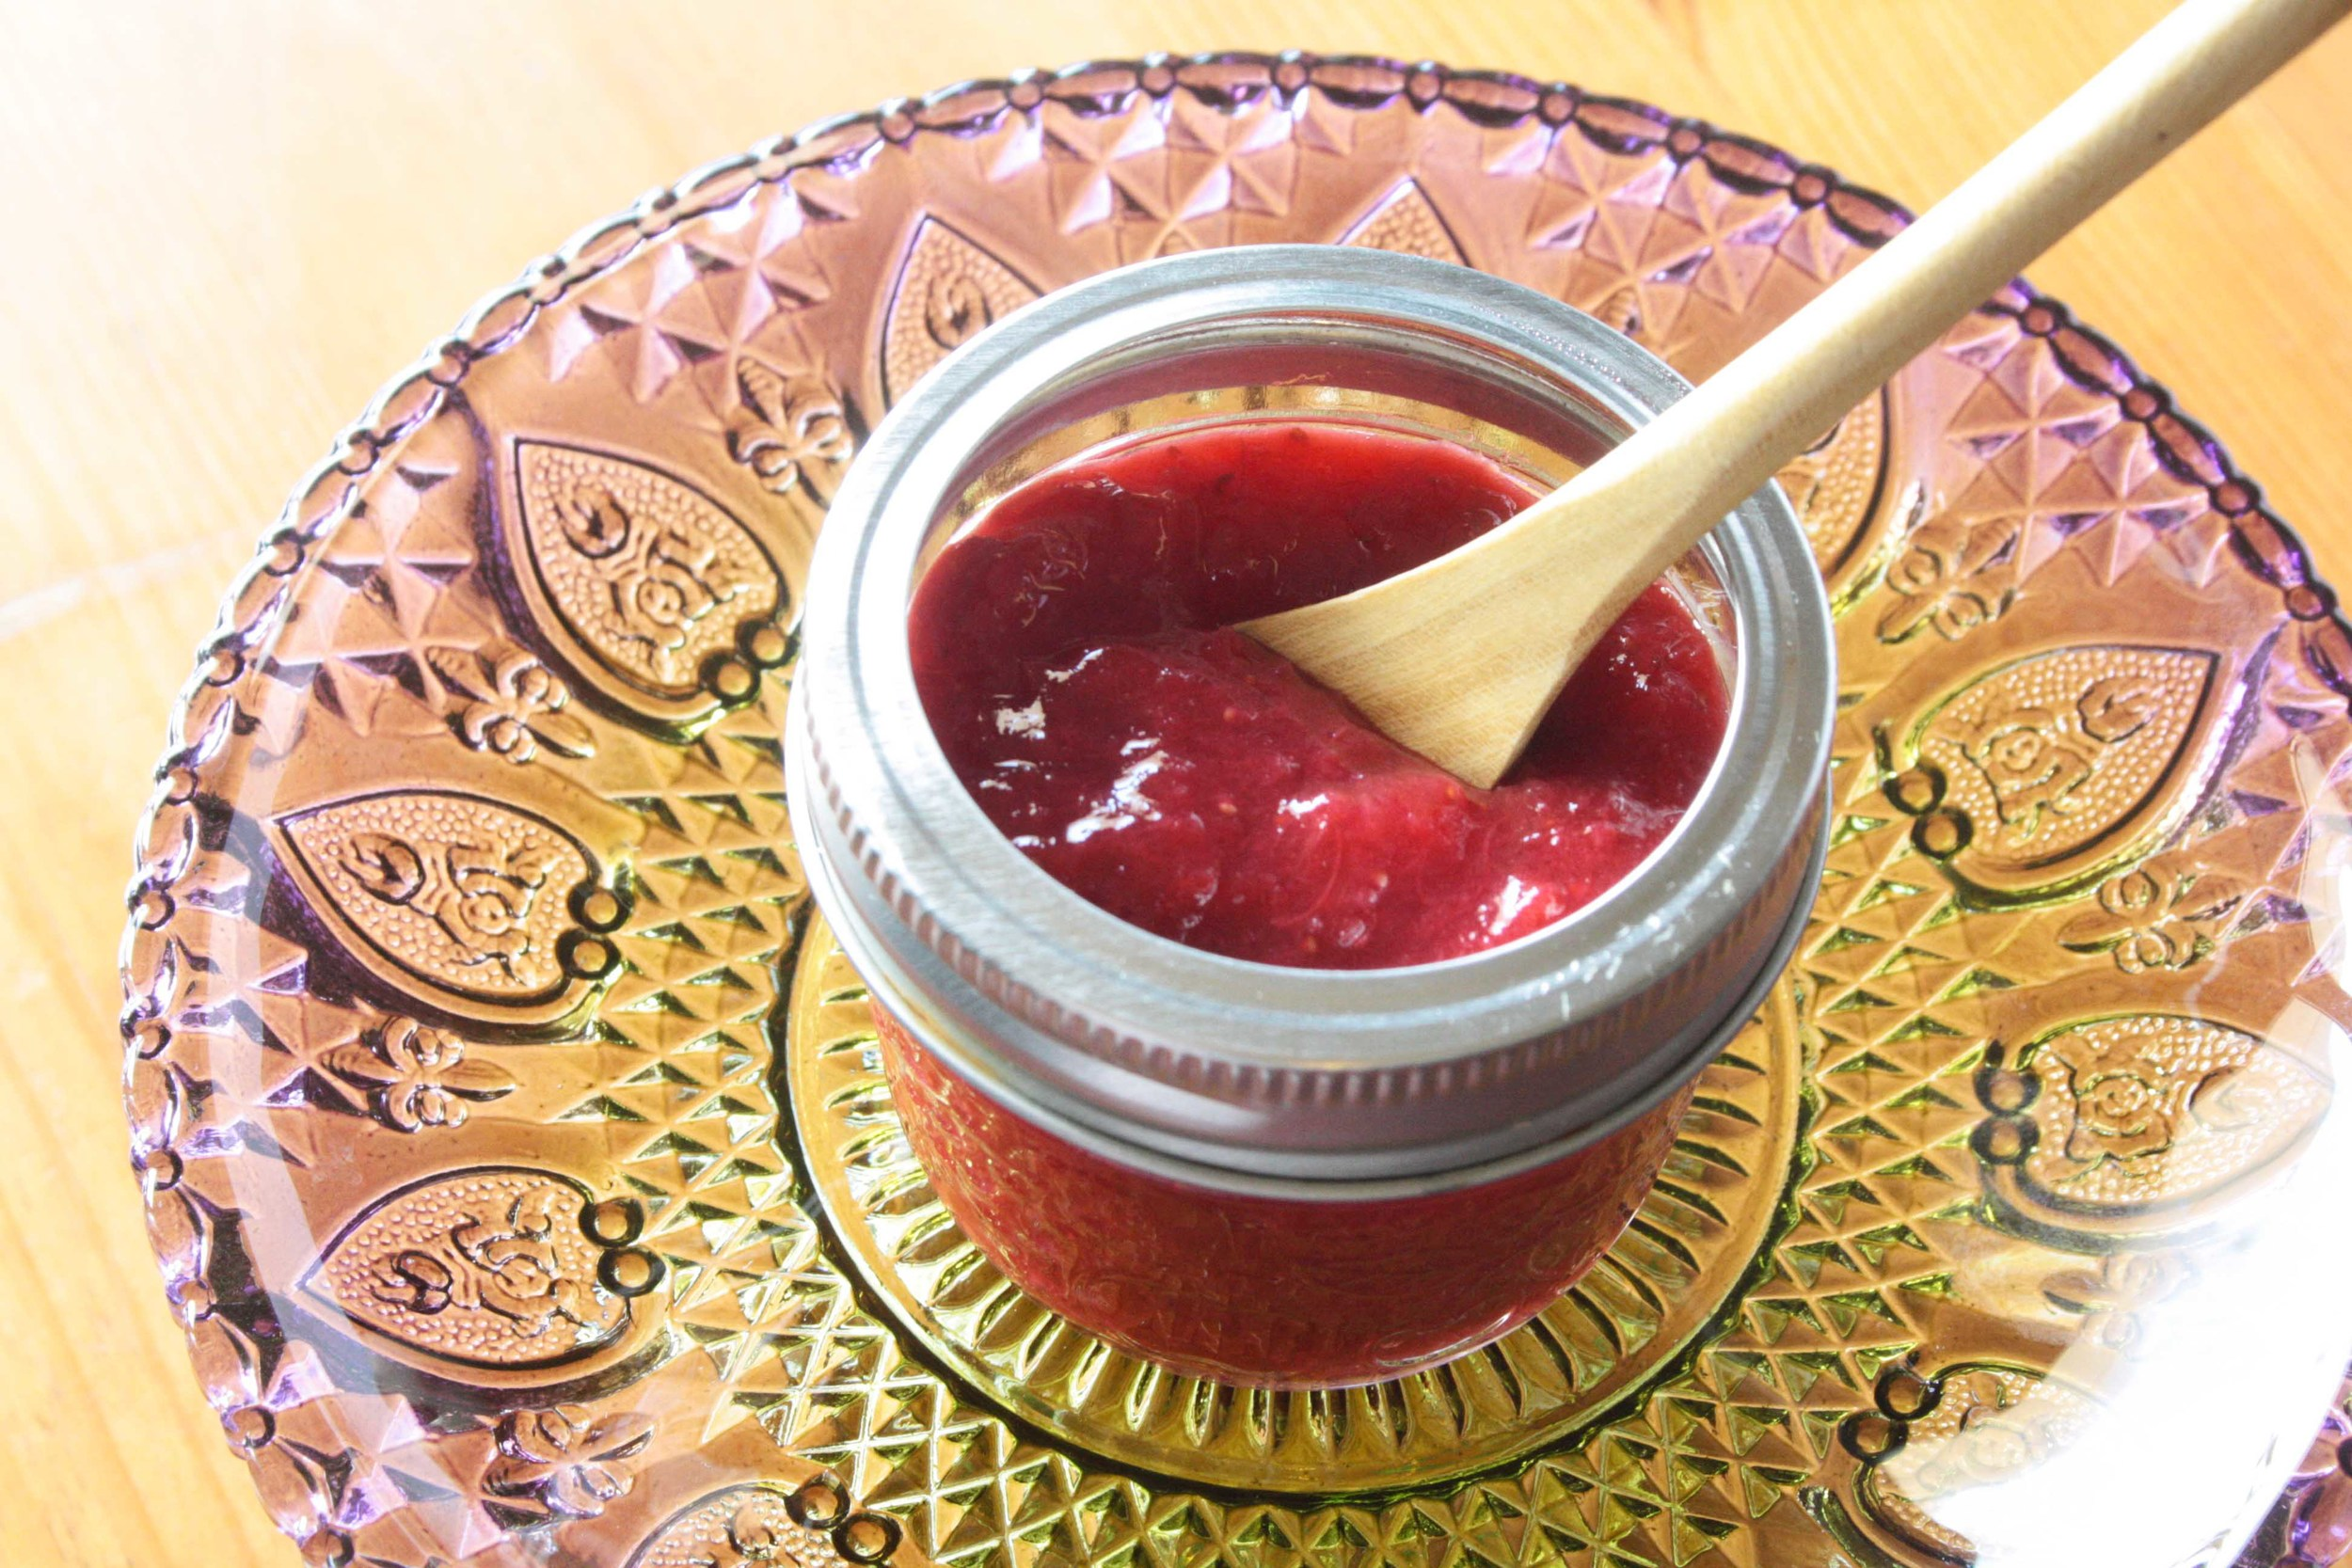 Simple Strawberry and Rhubarb Jam